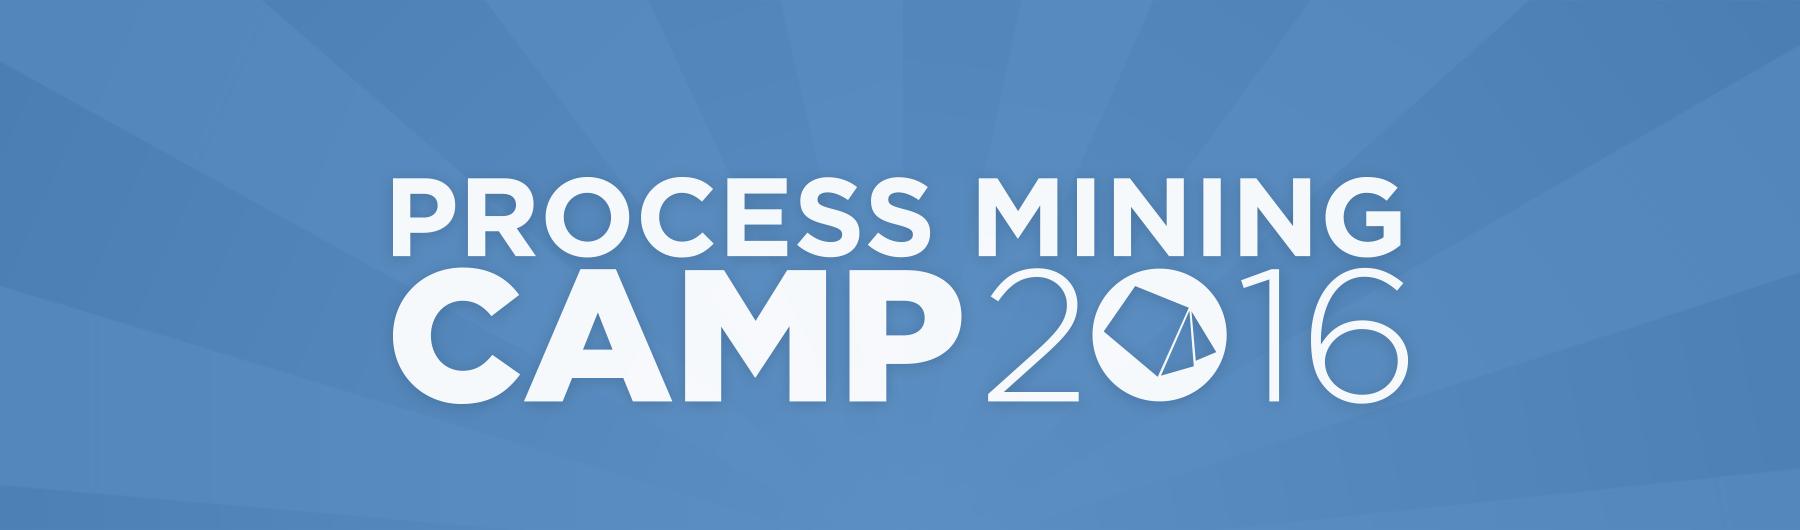 Process Mining Camp 2016